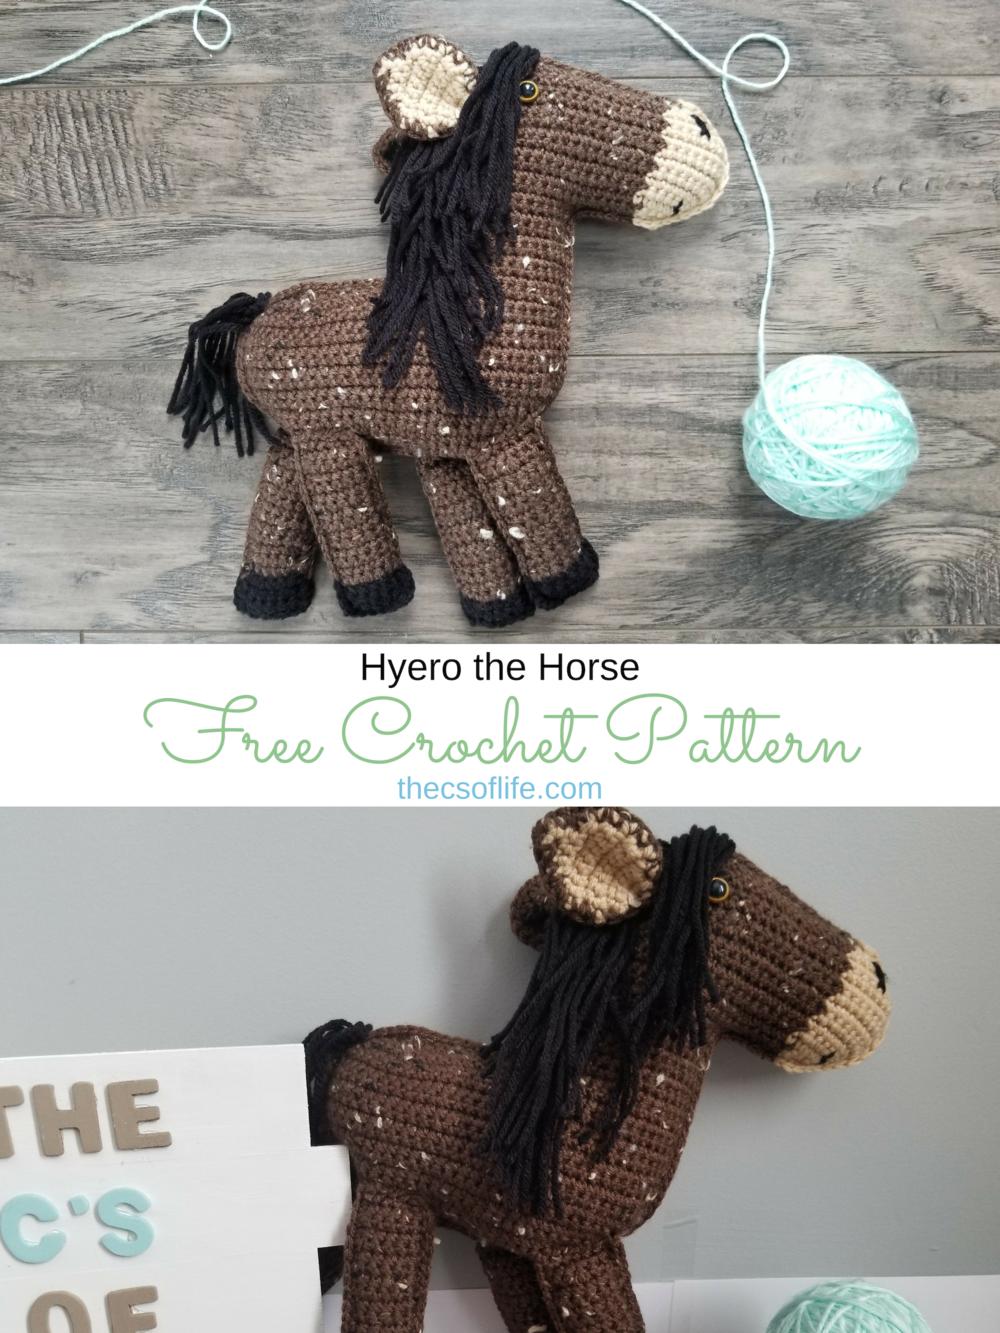 Hyero the Horse- Free Crochet Pattern